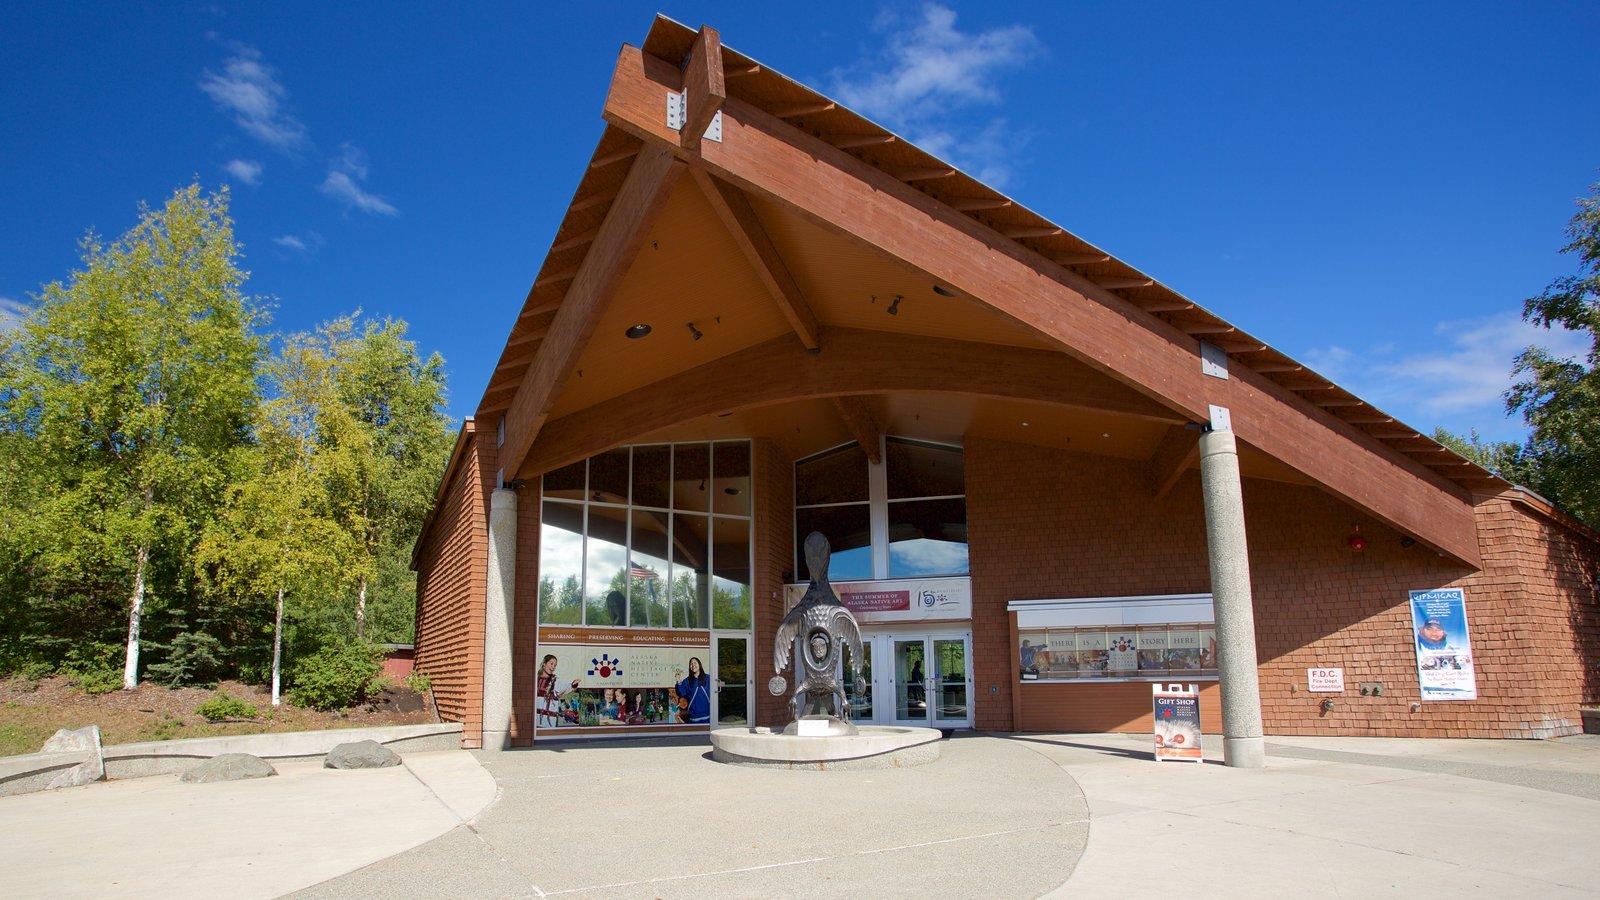 Alaska Native Heritage Center showing a statue or sculpture